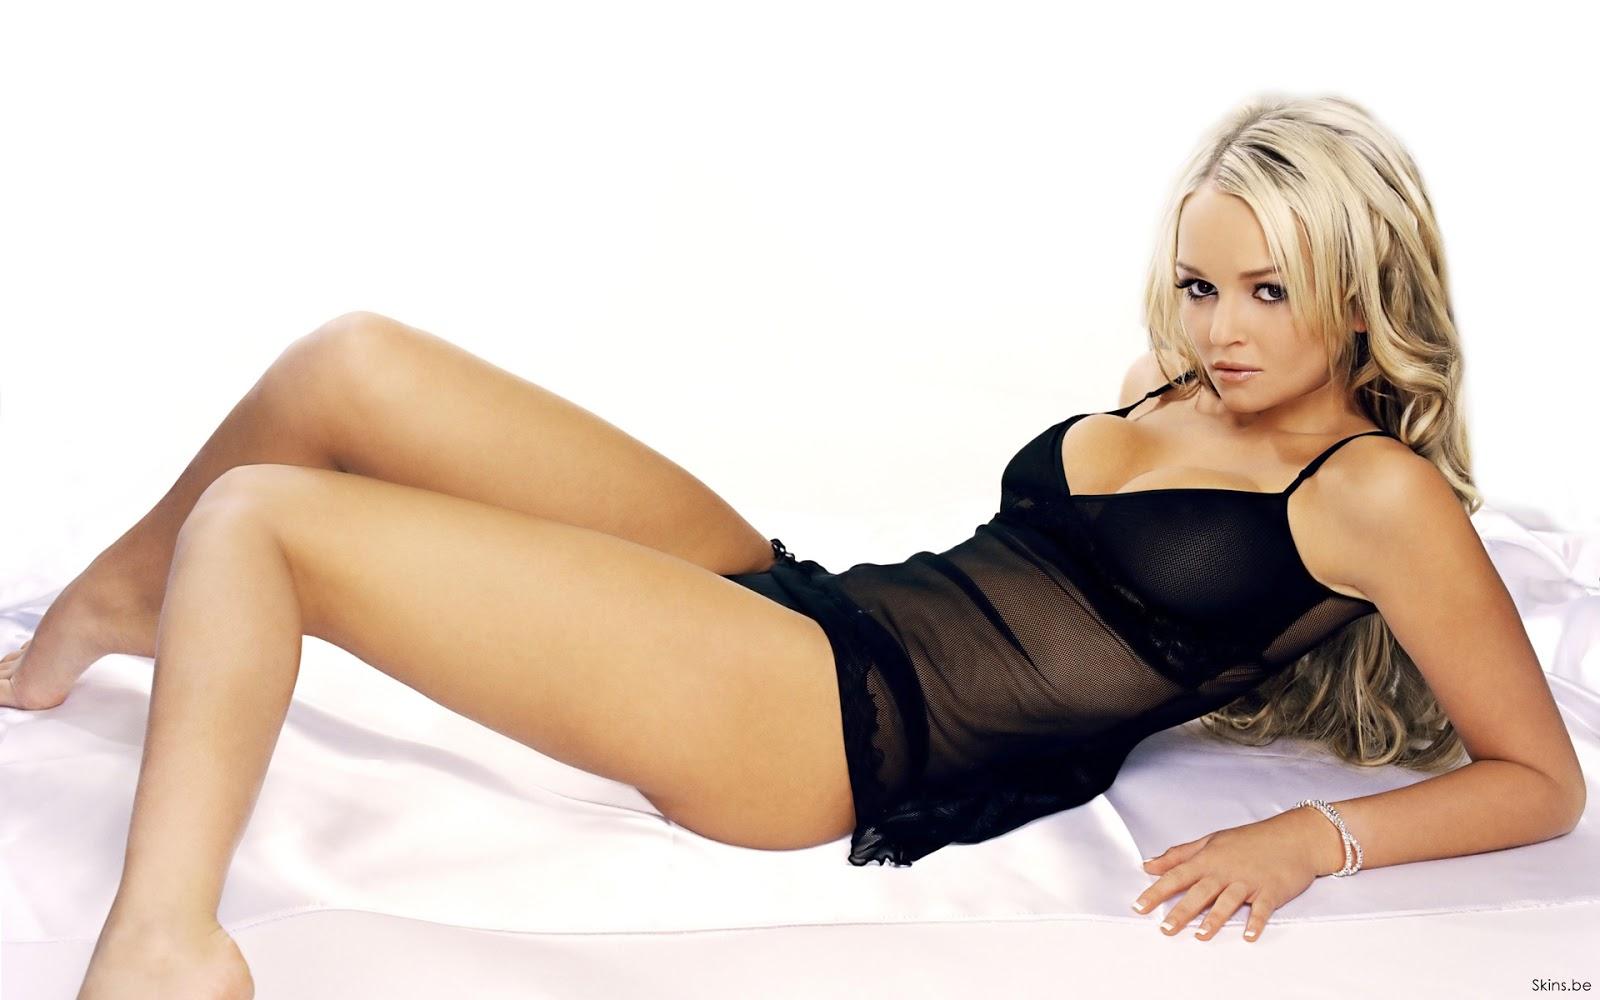 Fotos de celebridades sexy gratis